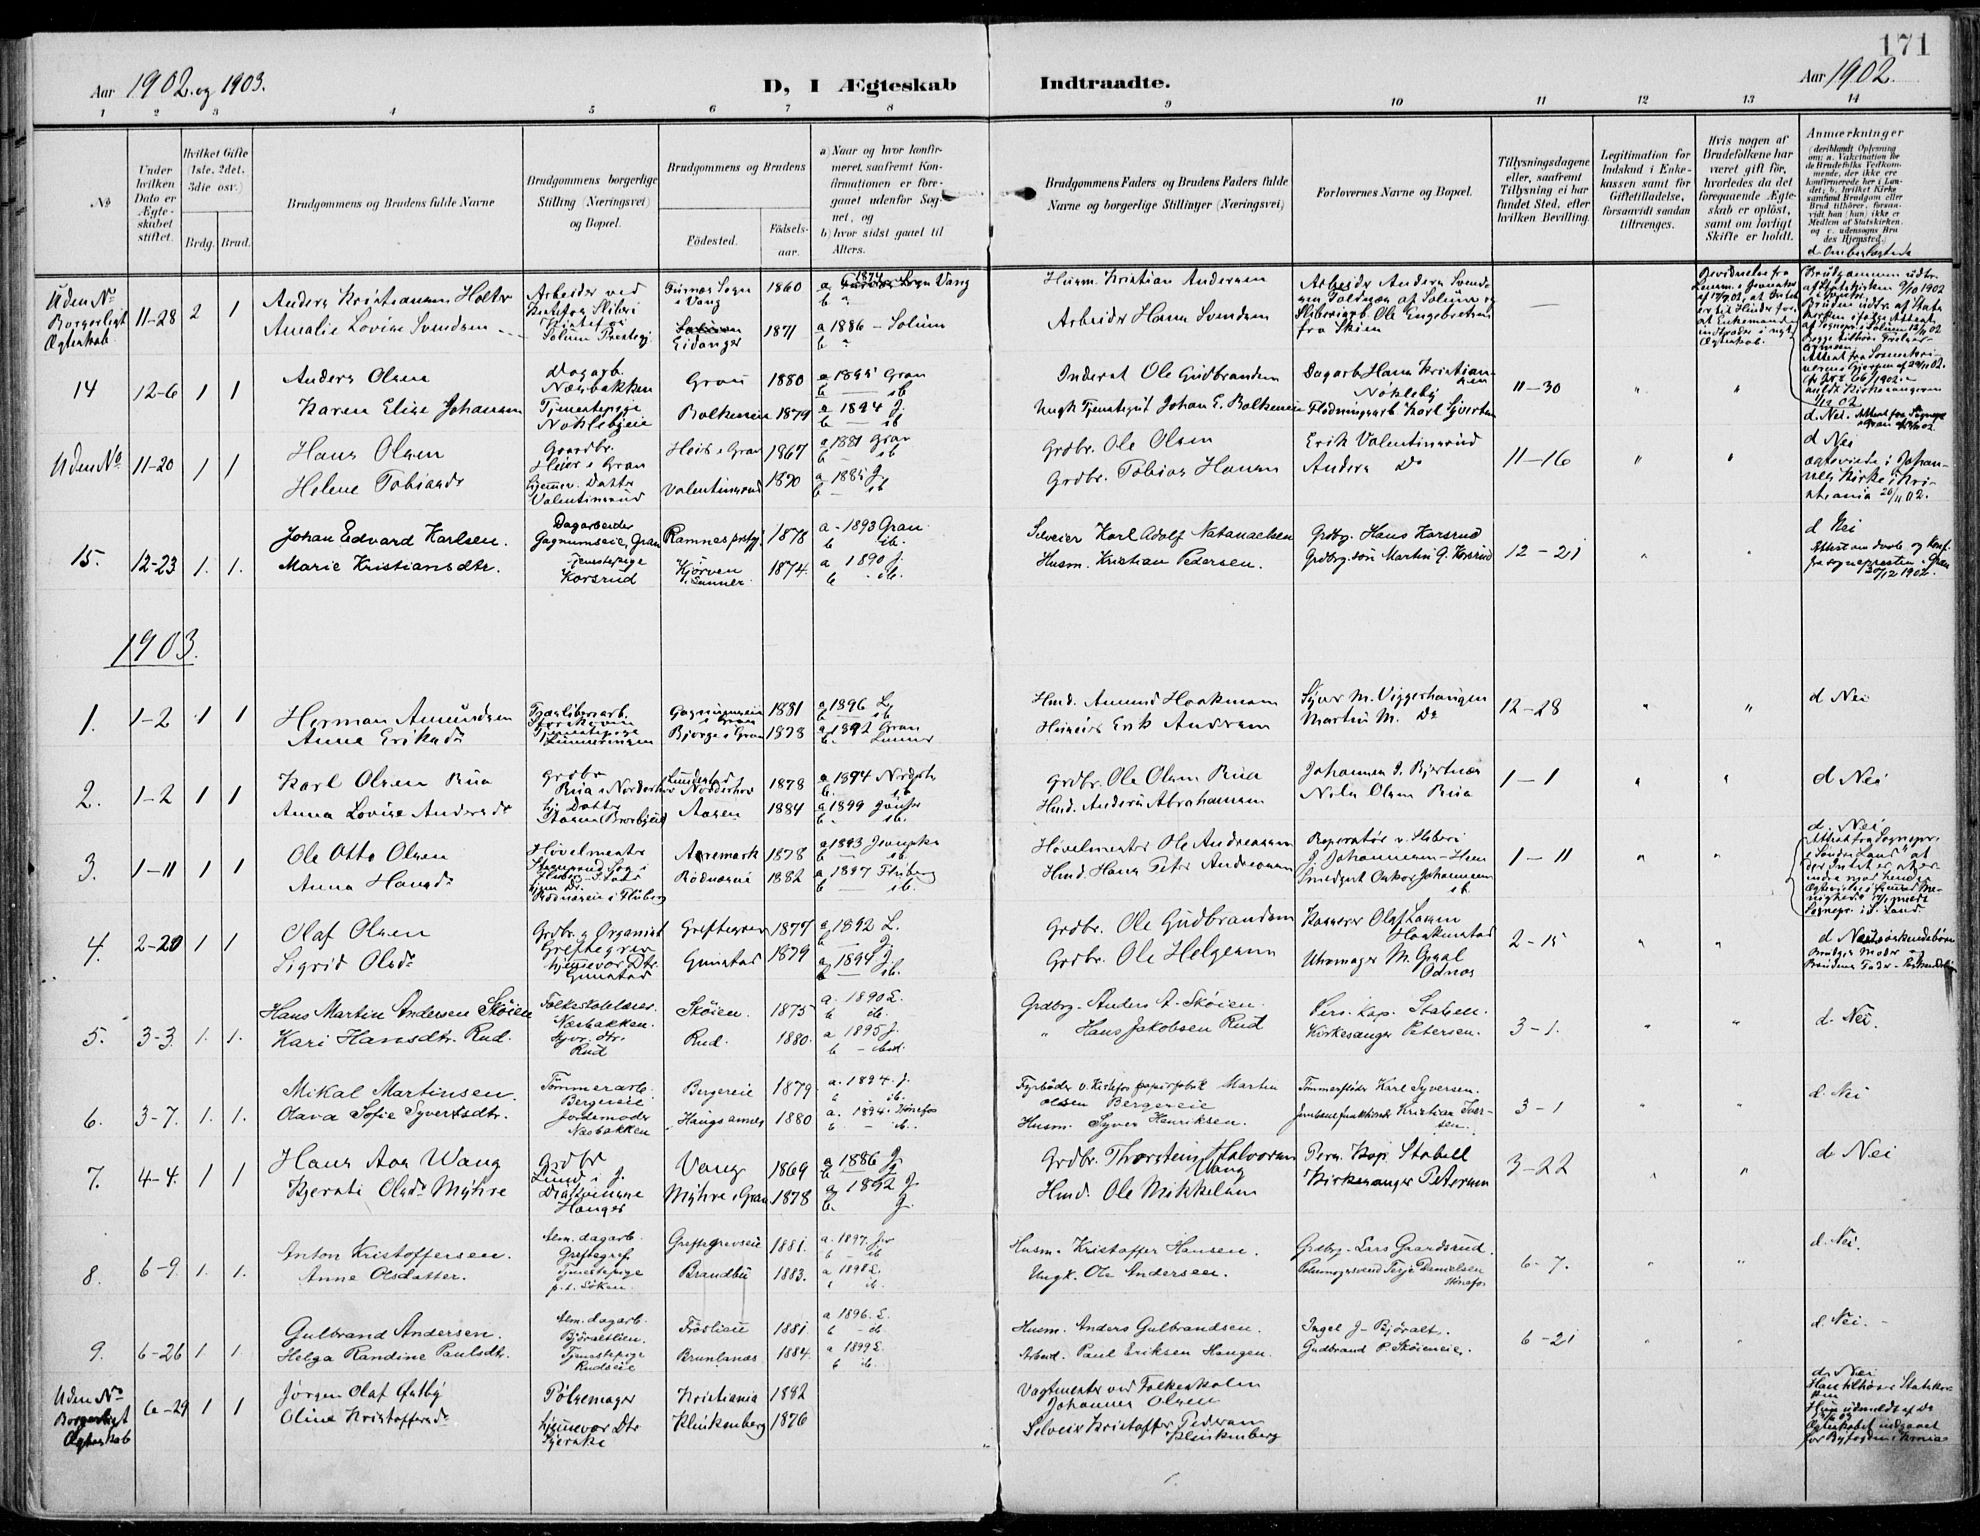 SAH, Jevnaker prestekontor, Ministerialbok nr. 11, 1902-1913, s. 171